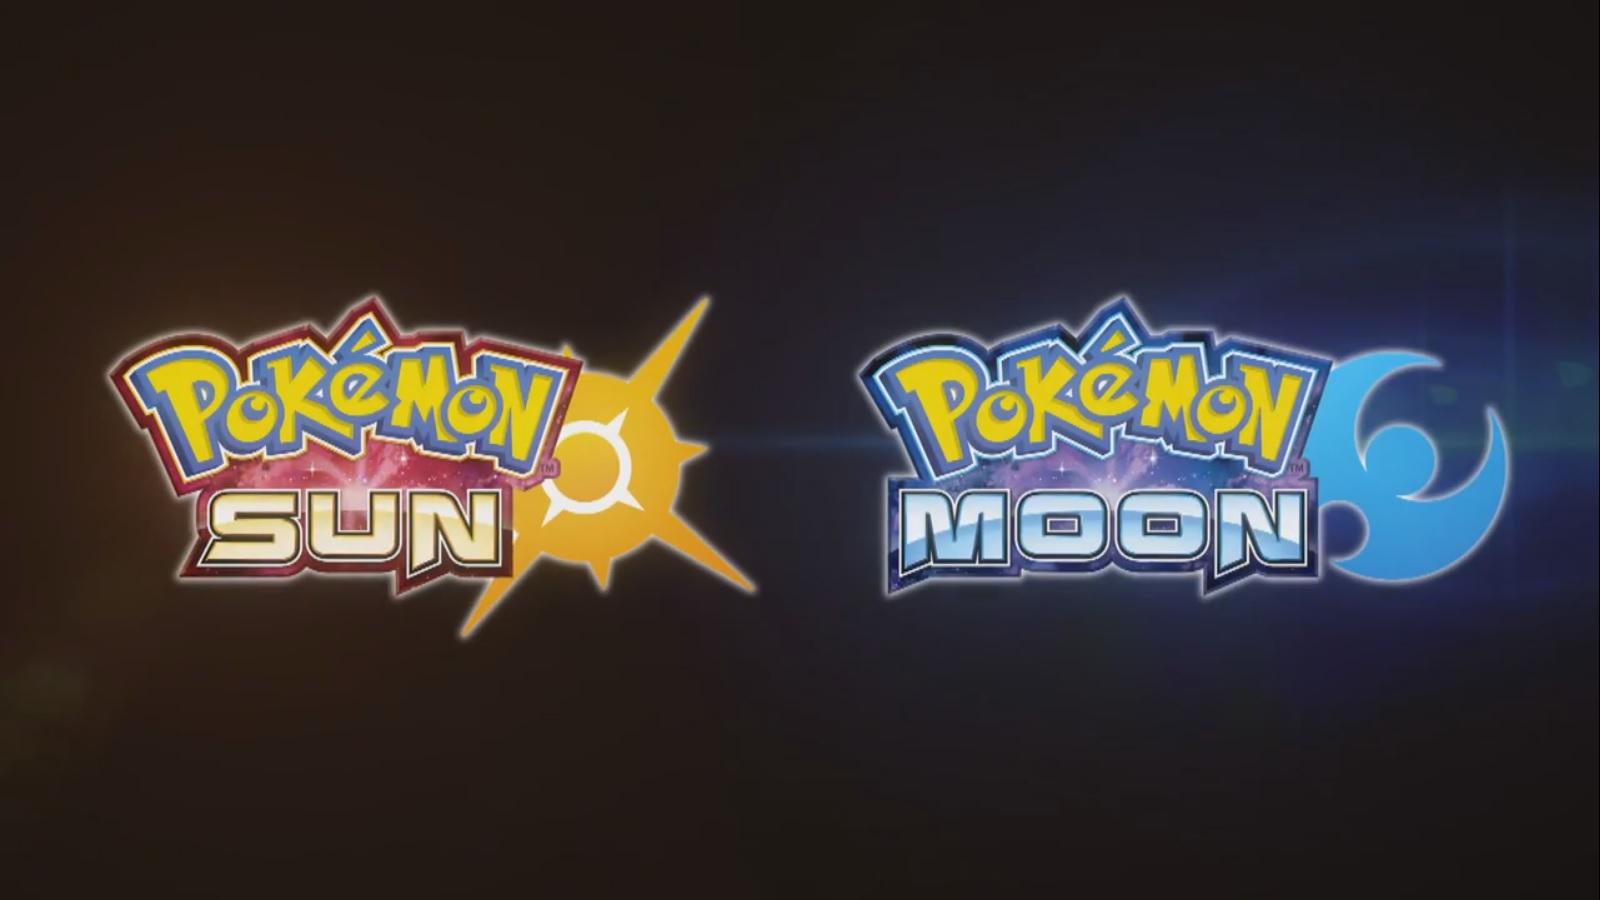 Pokemon sun and moon serebii - 71a4